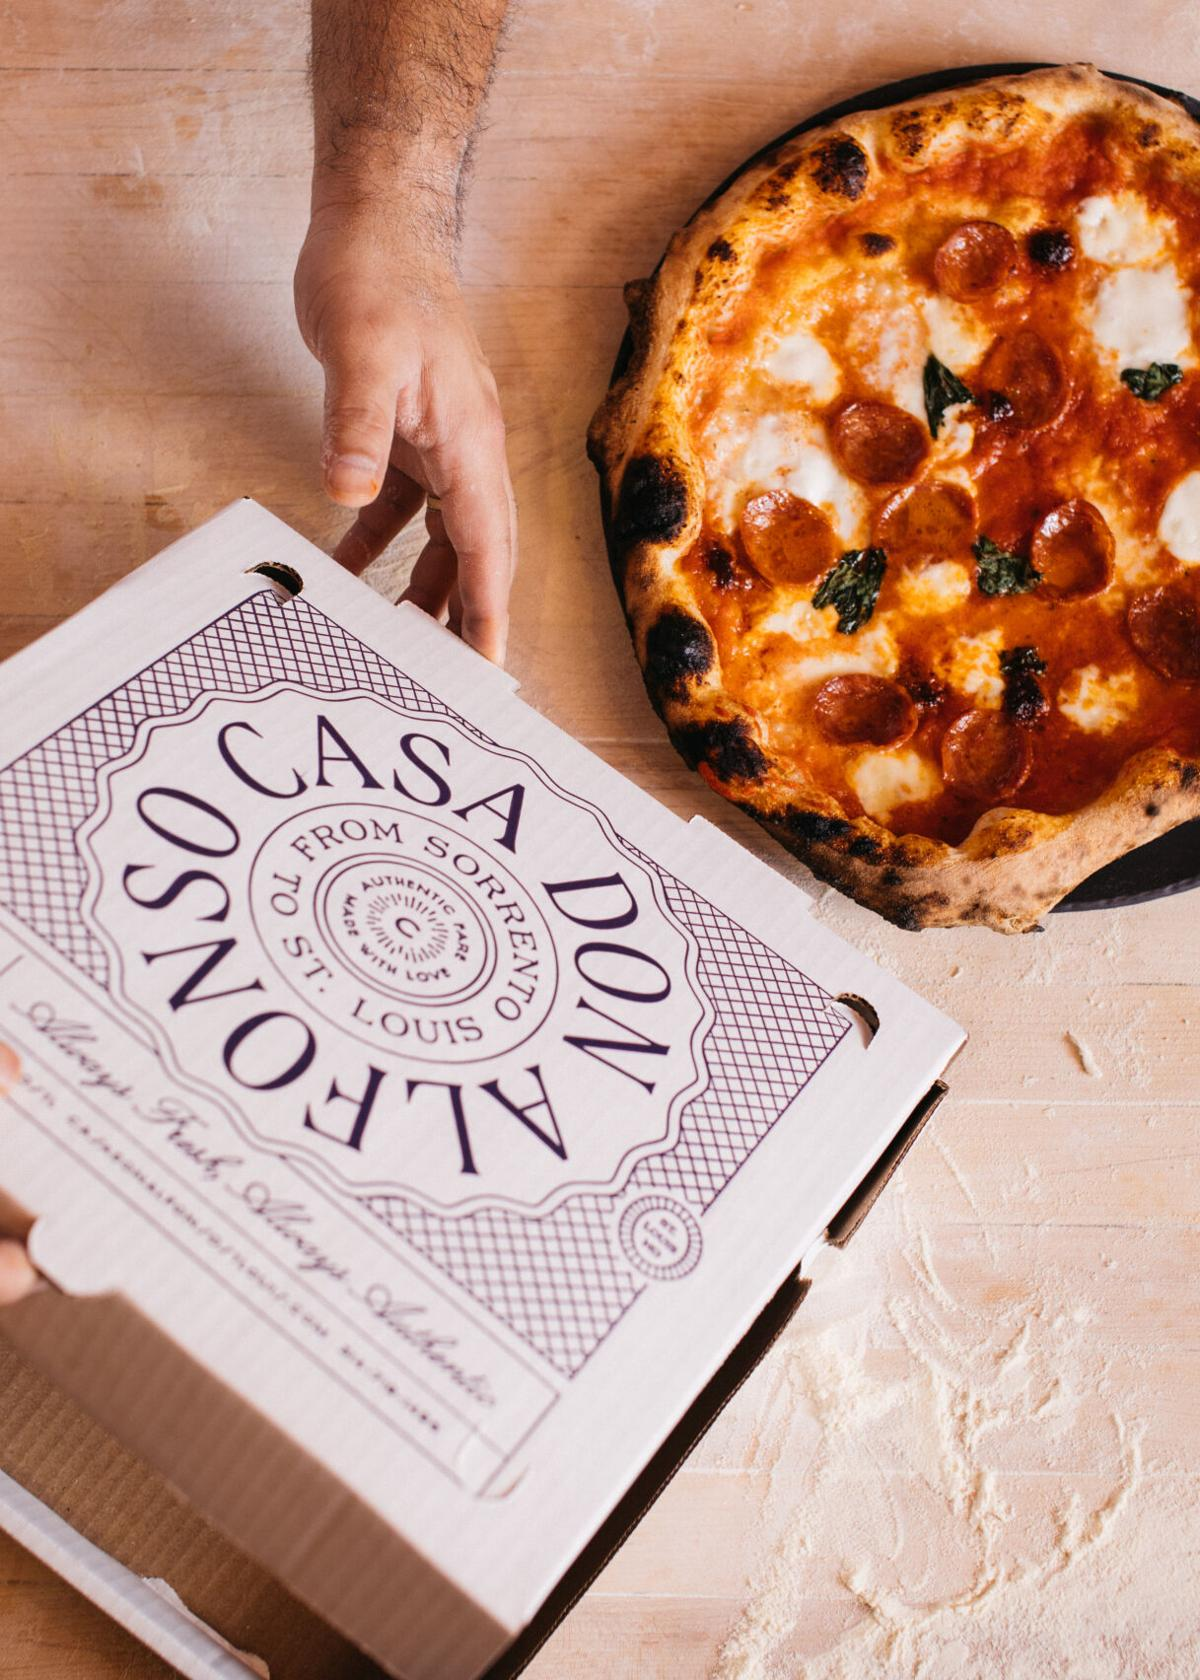 Casa don Alfonso pizza